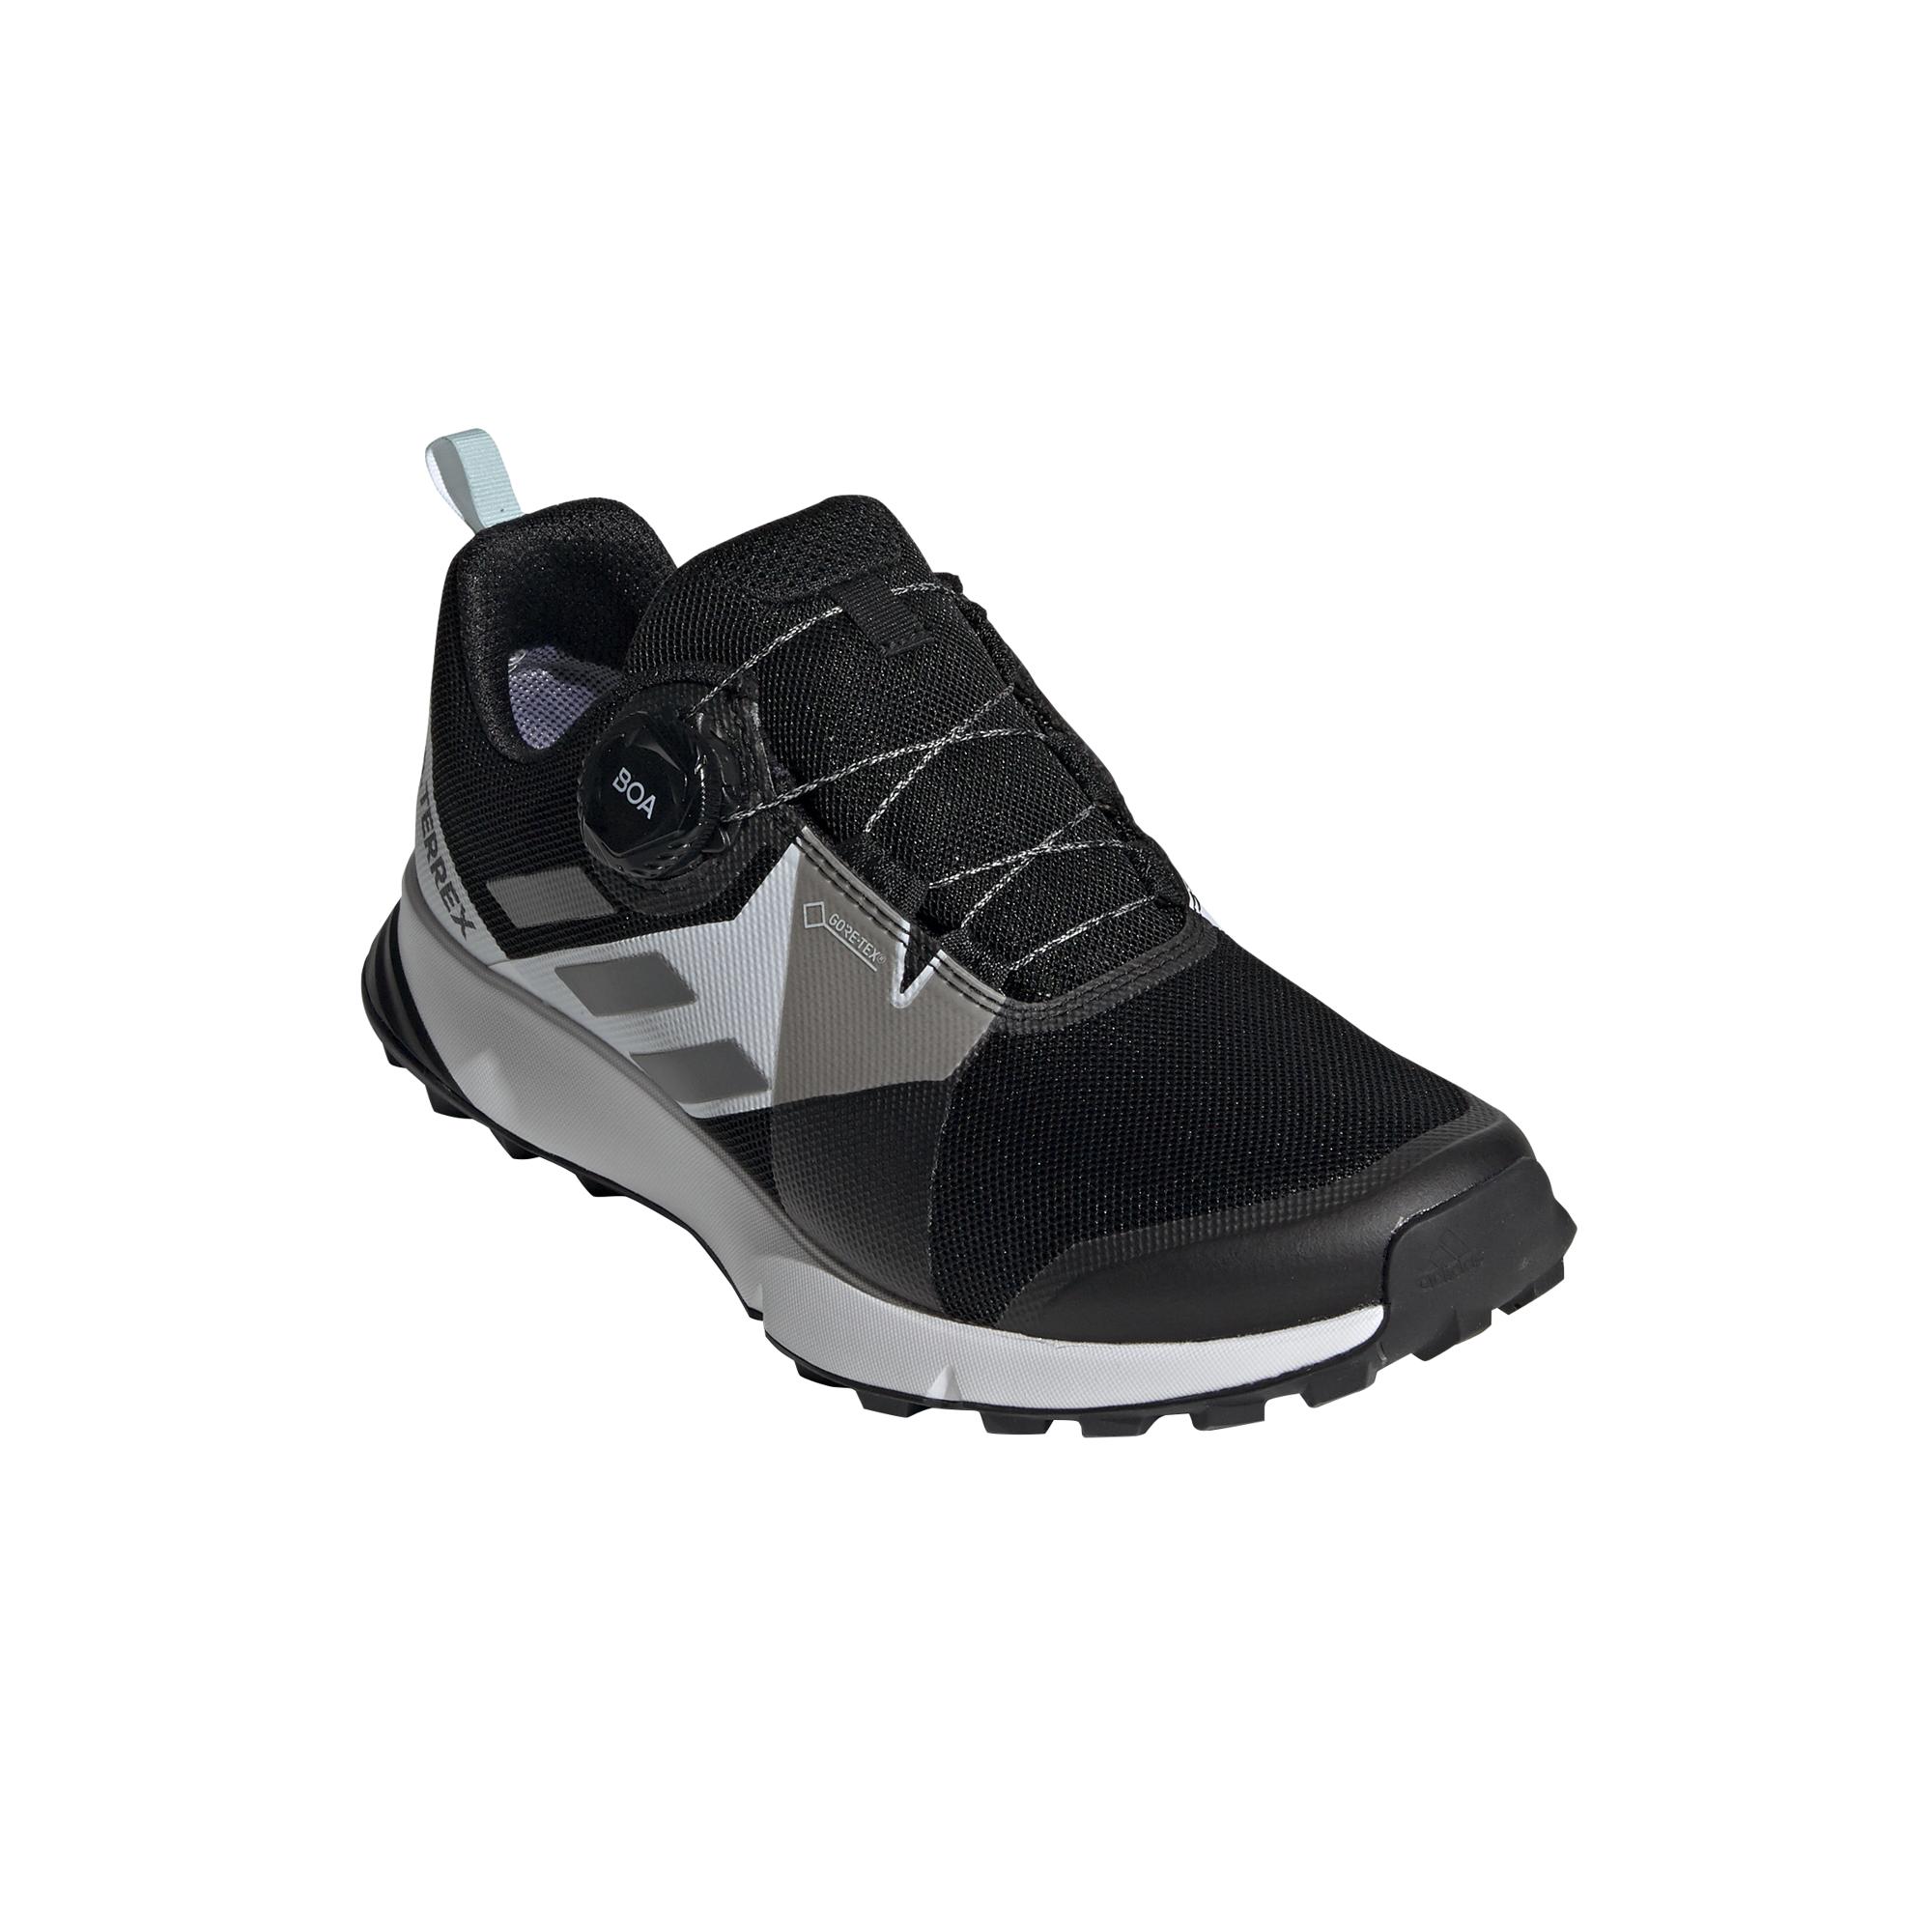 adidas outdoor Men's Terrex Two GTX